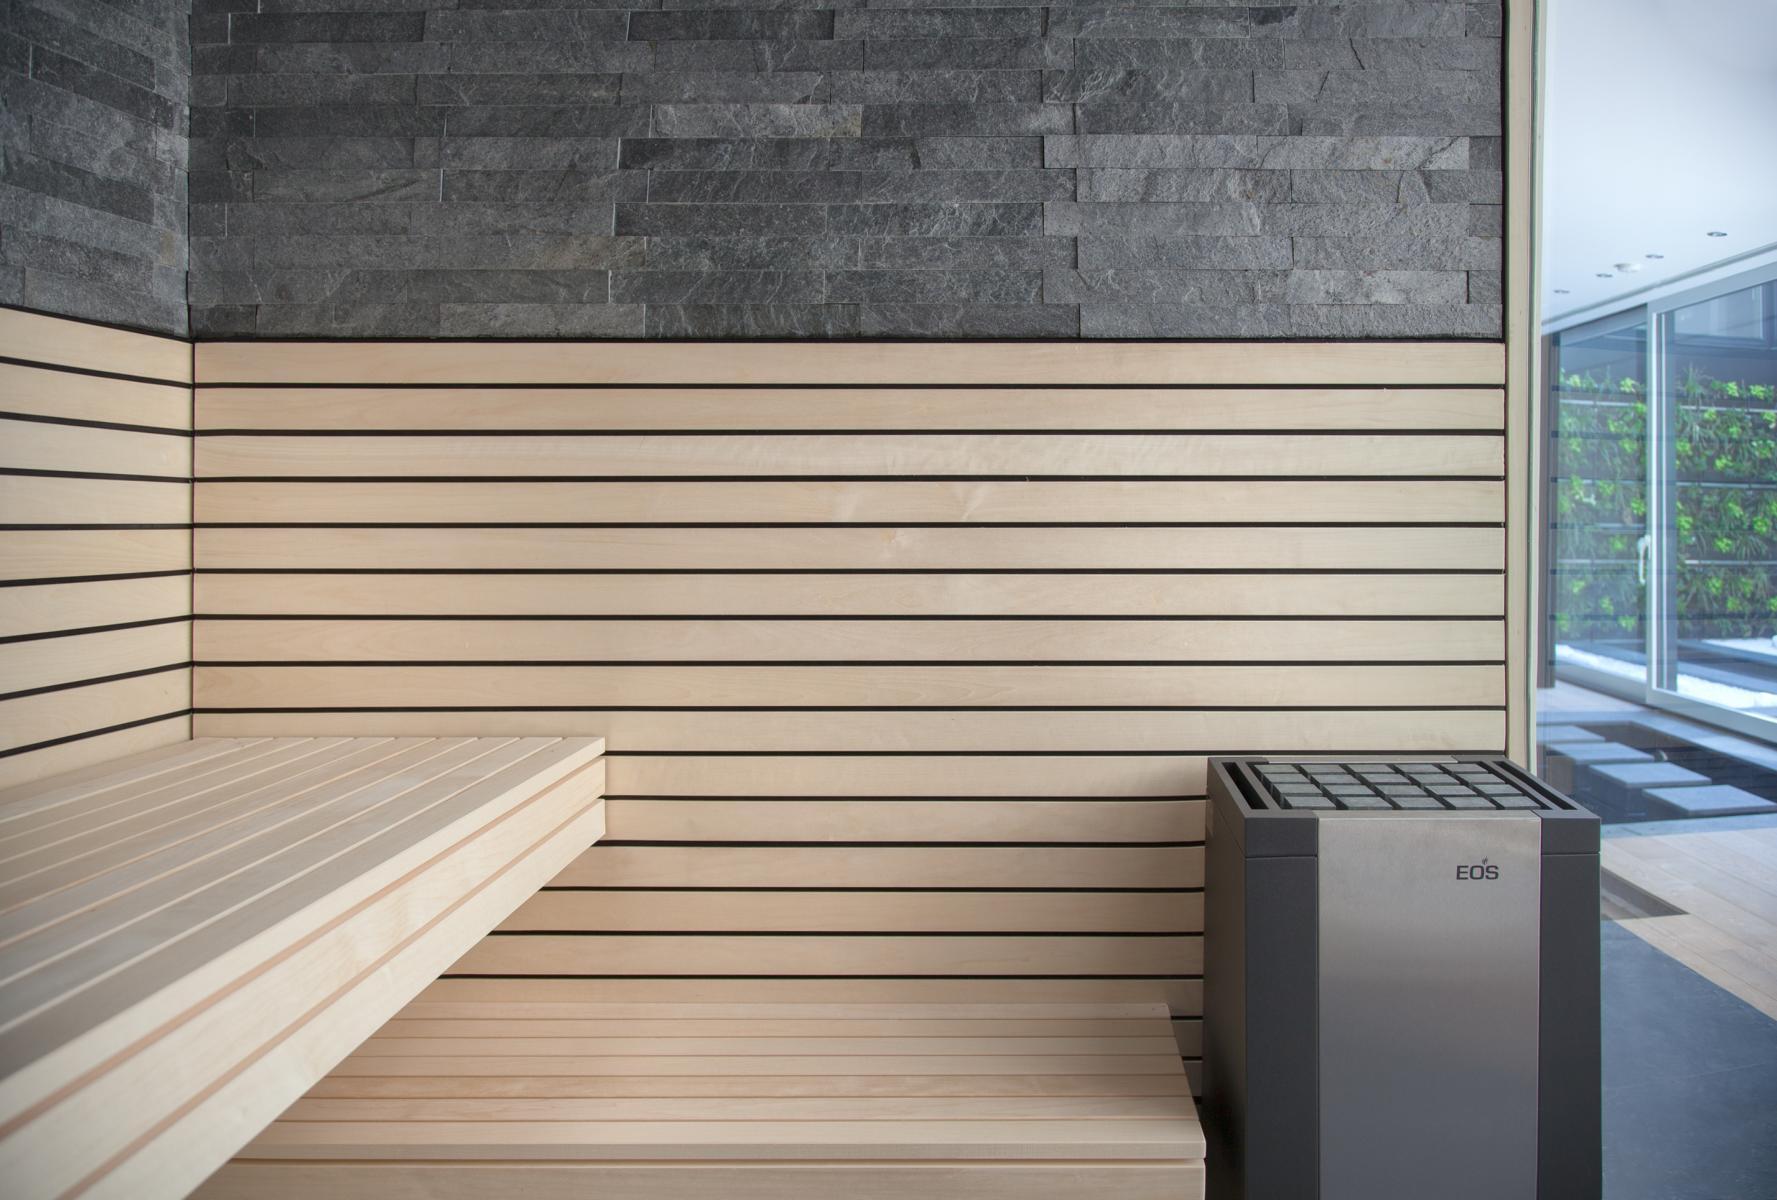 Top Corso Sauna Manufaktur VH05